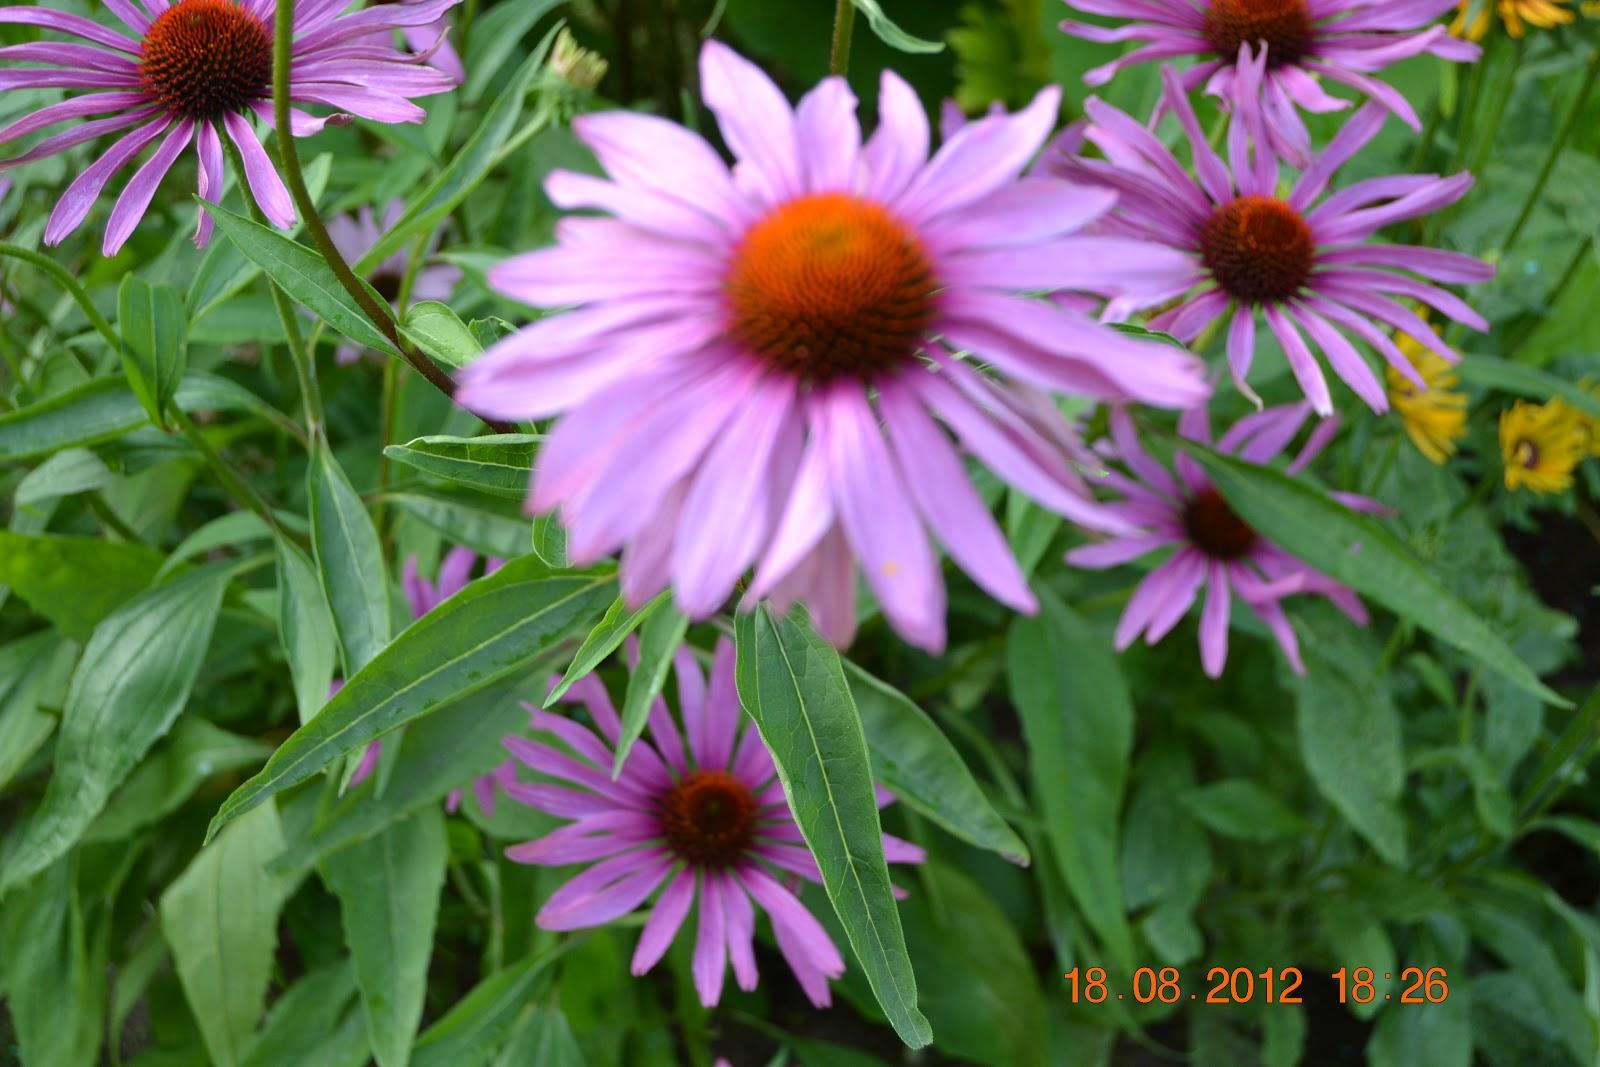 Perennoja – Some perennials